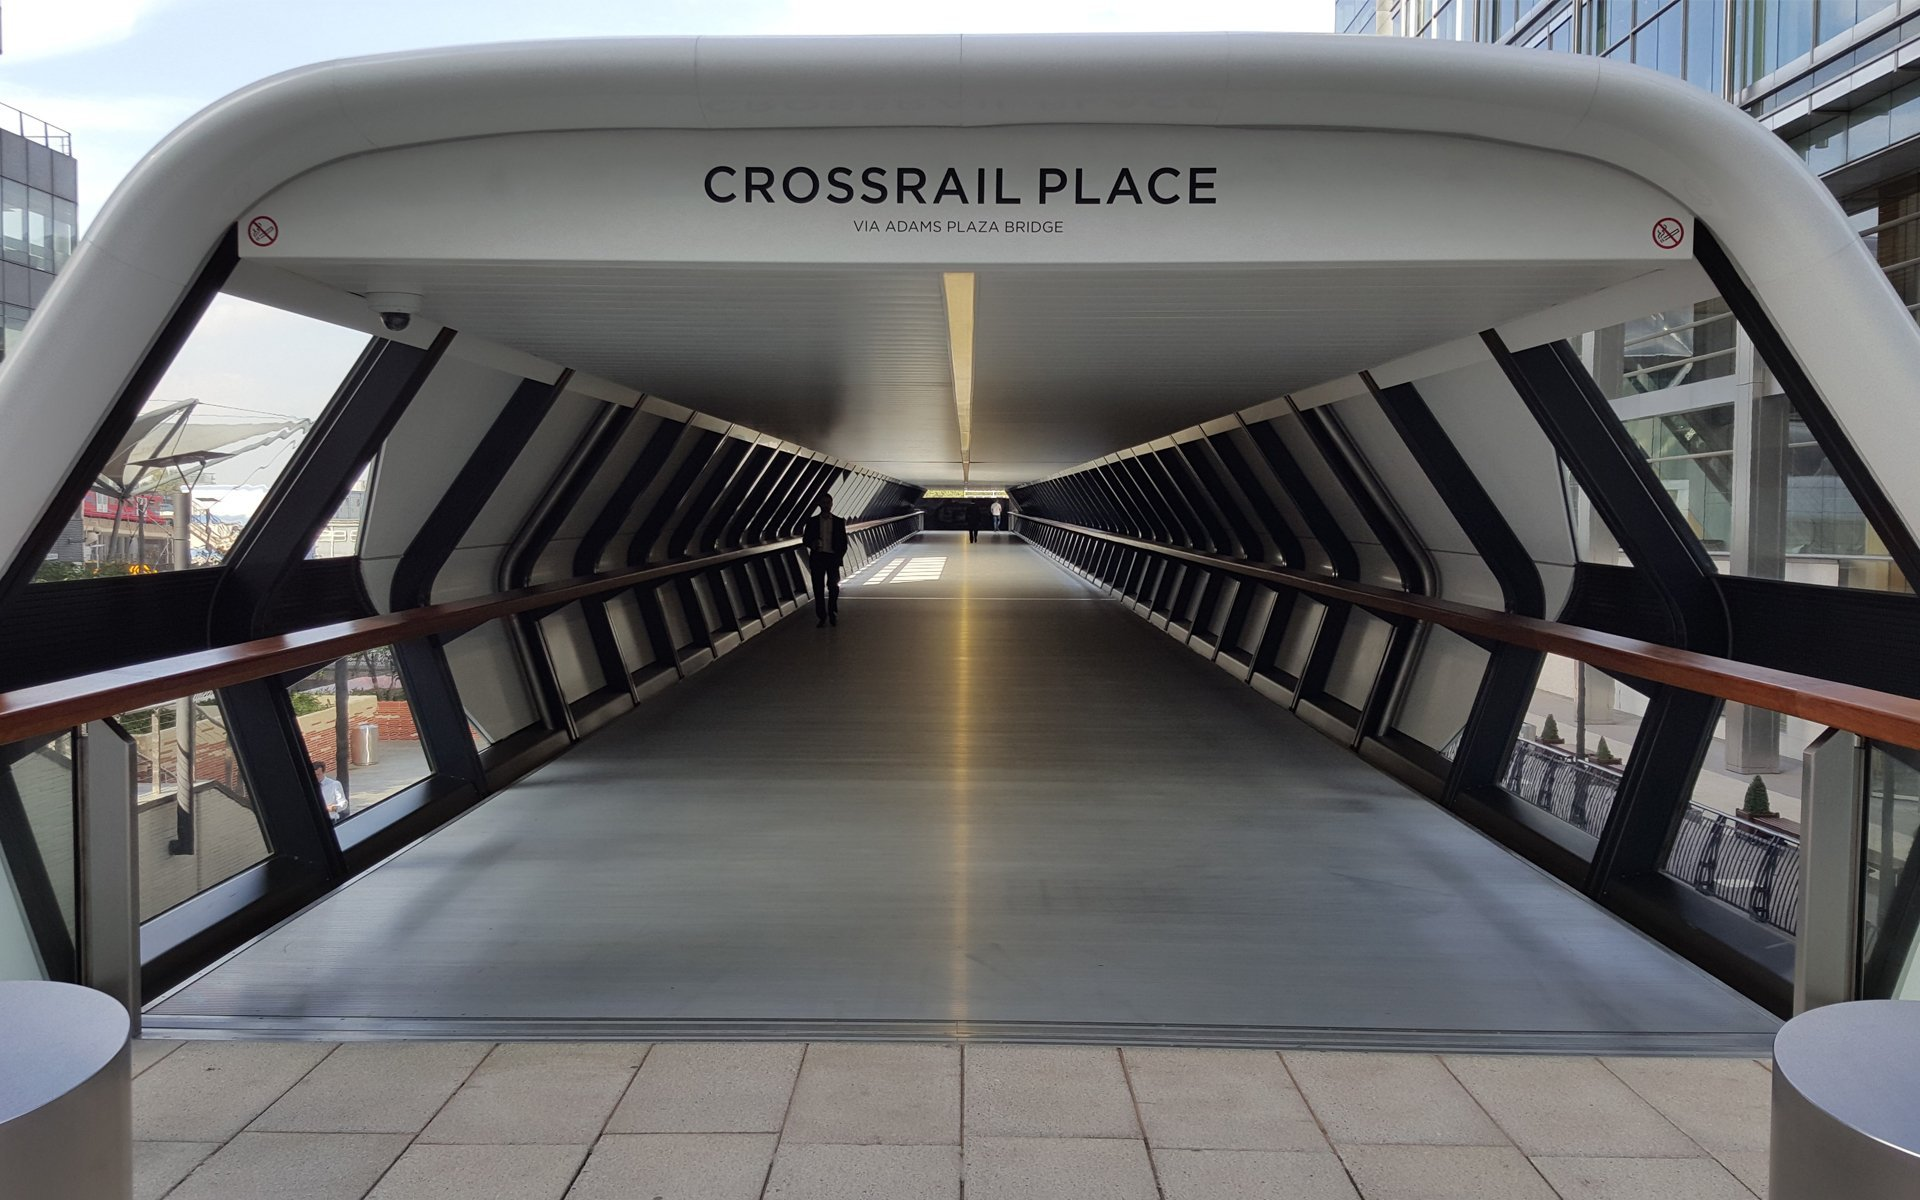 Crossrail Surveillance London